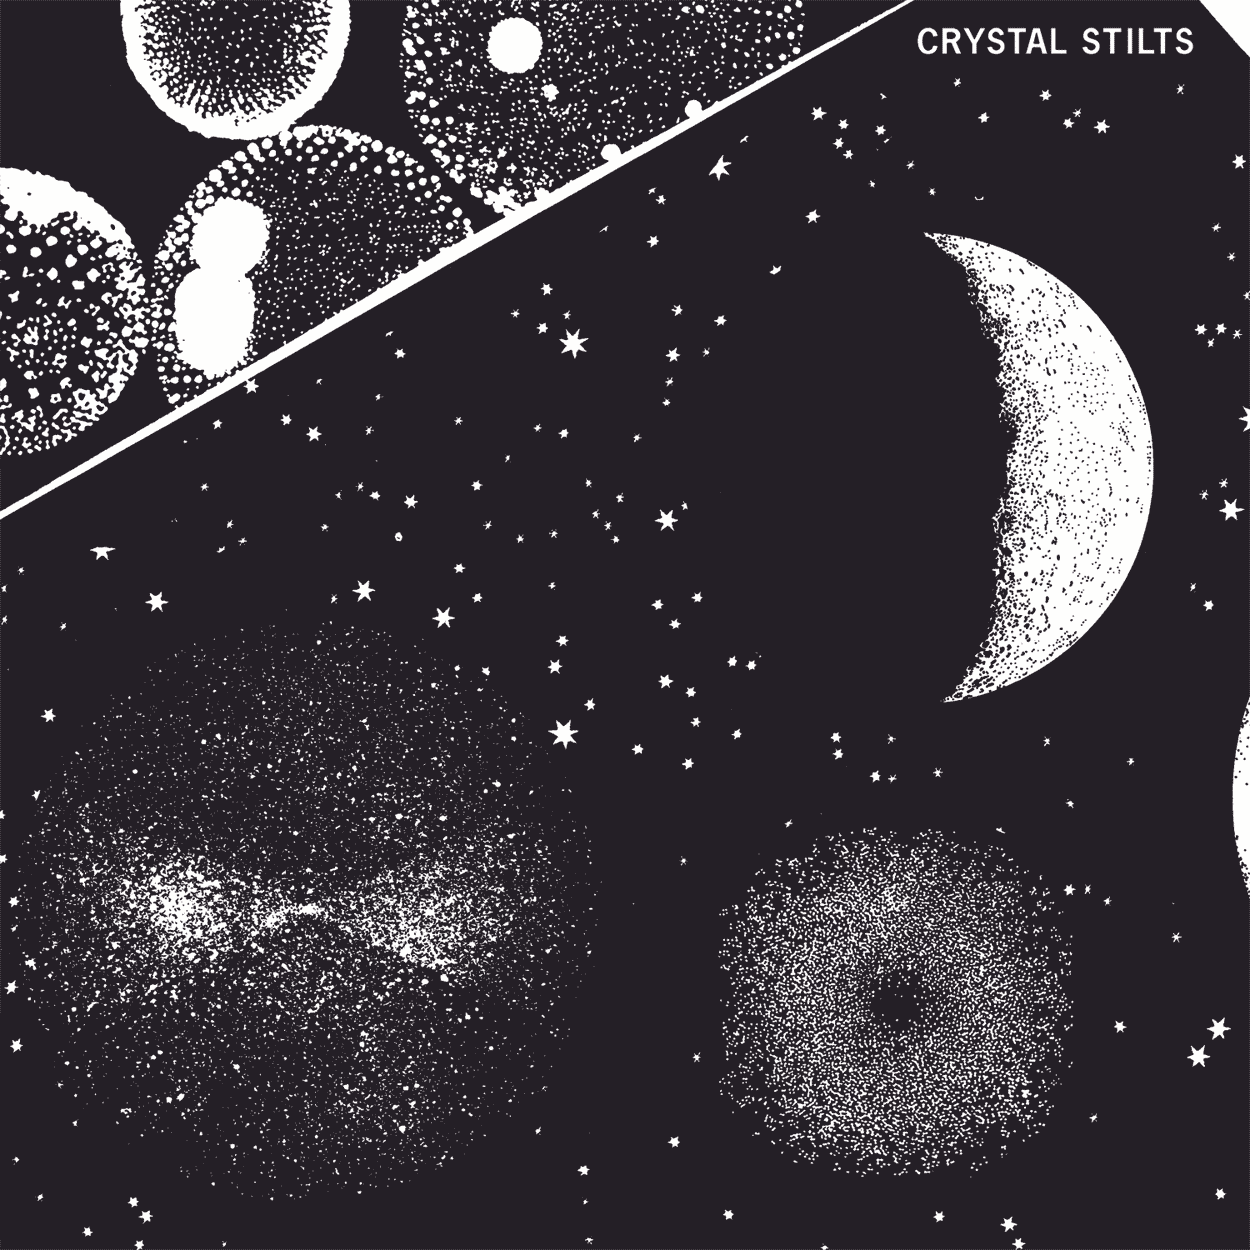 2011 Year End Respect For Album Cover Art Digital